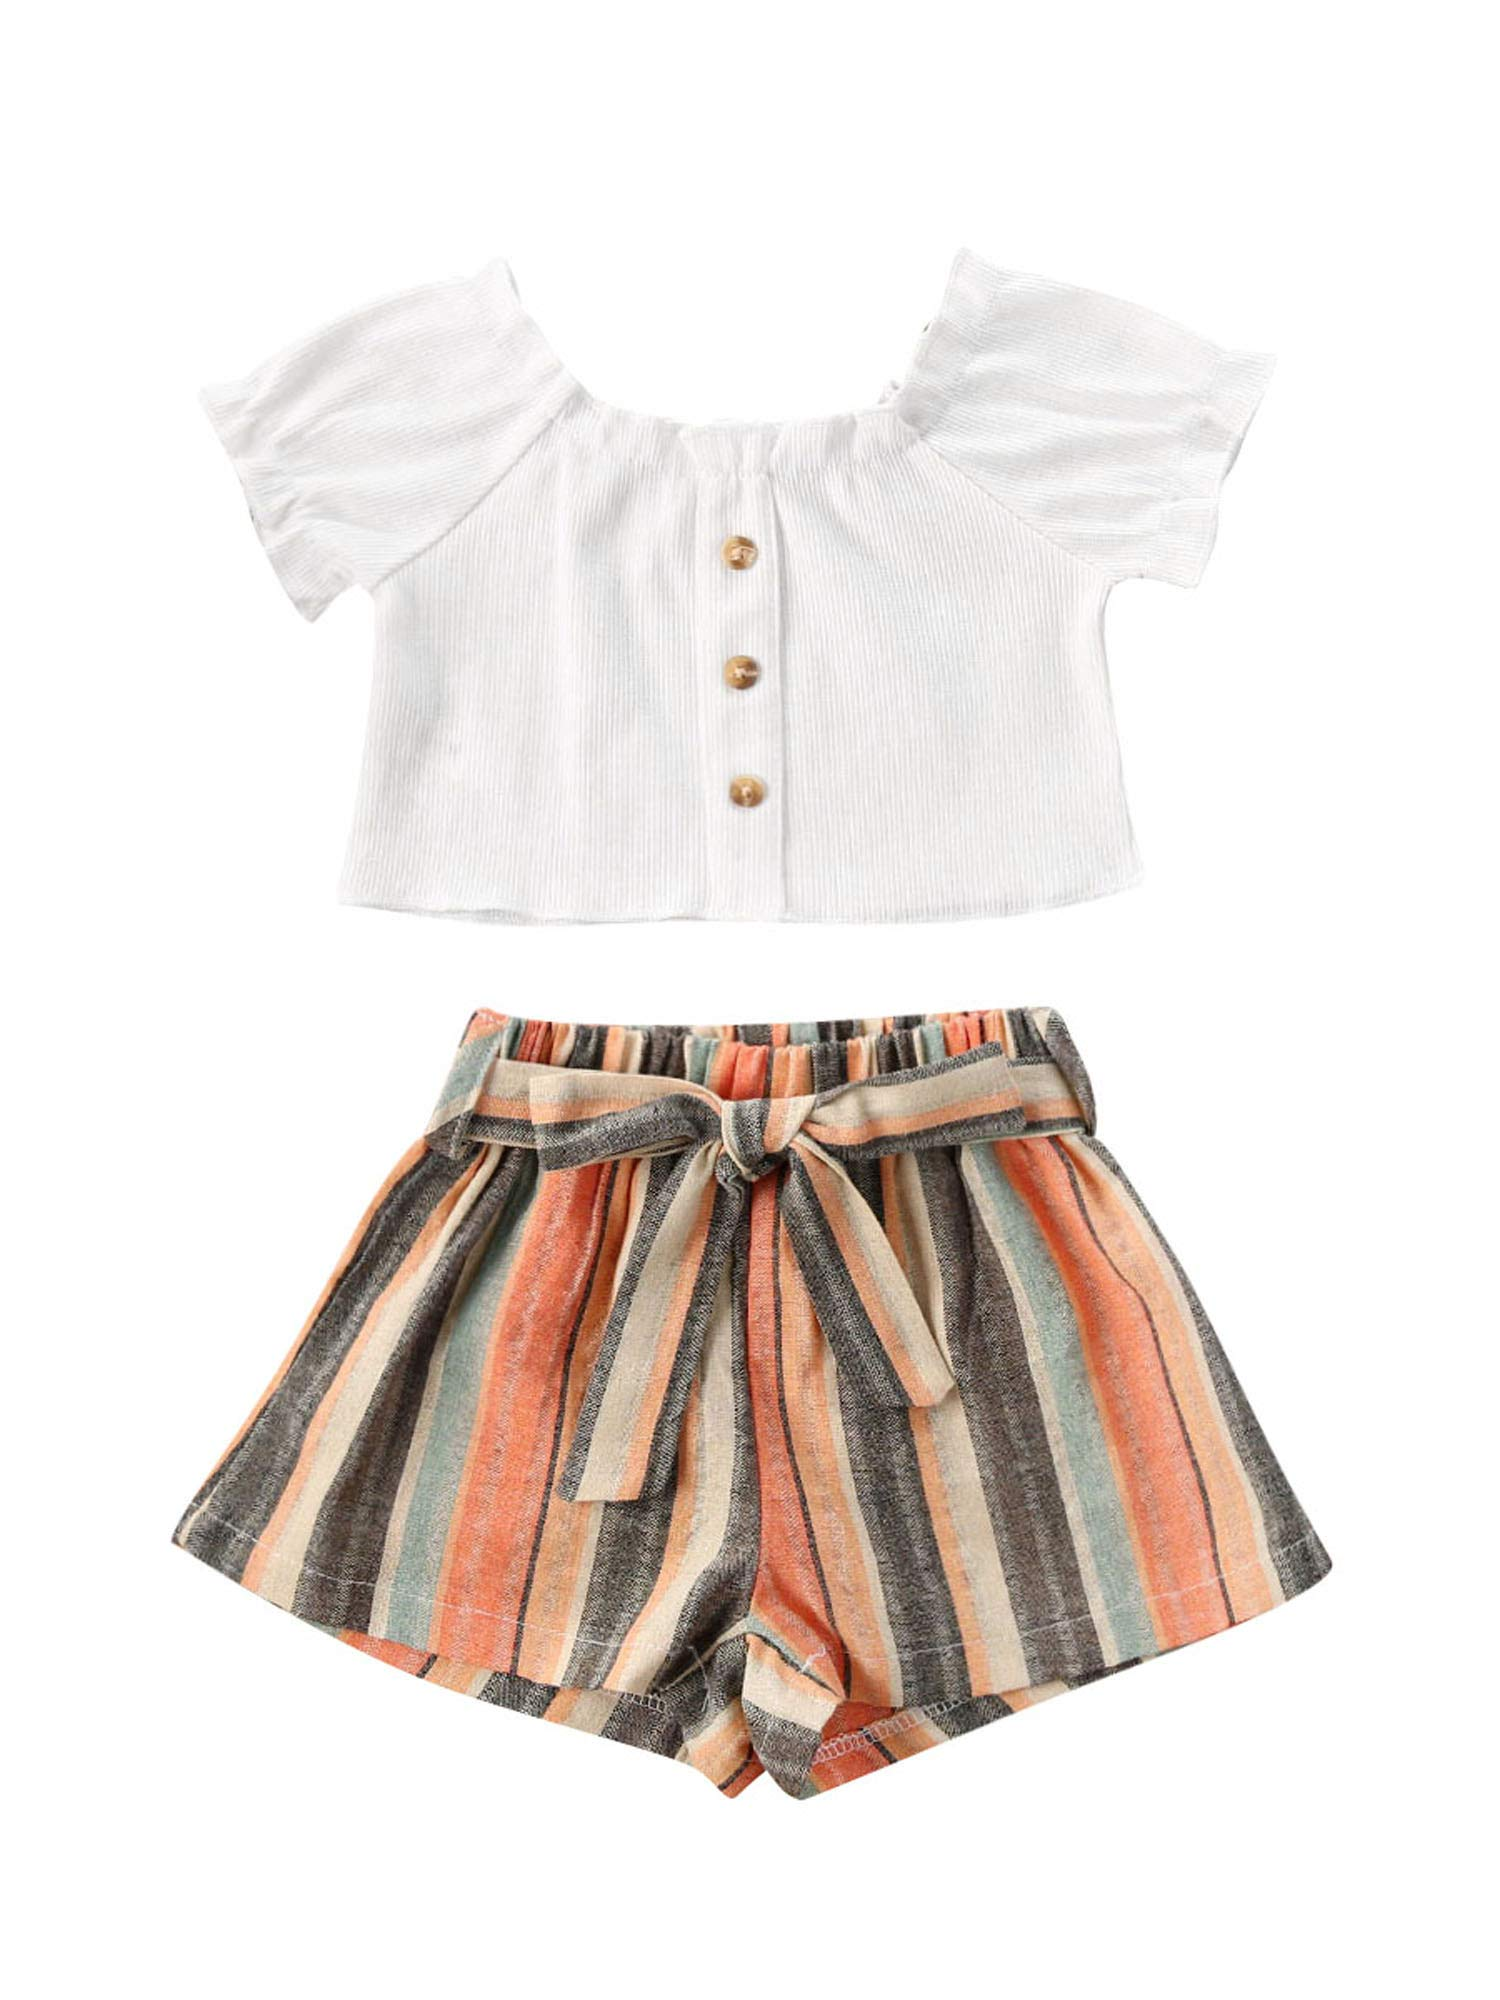 2Pcs/Set Toddler Kids Baby Girl Summer Short Sleeve T-Shirt Tops + Floral Short Sets Outfits Clothes